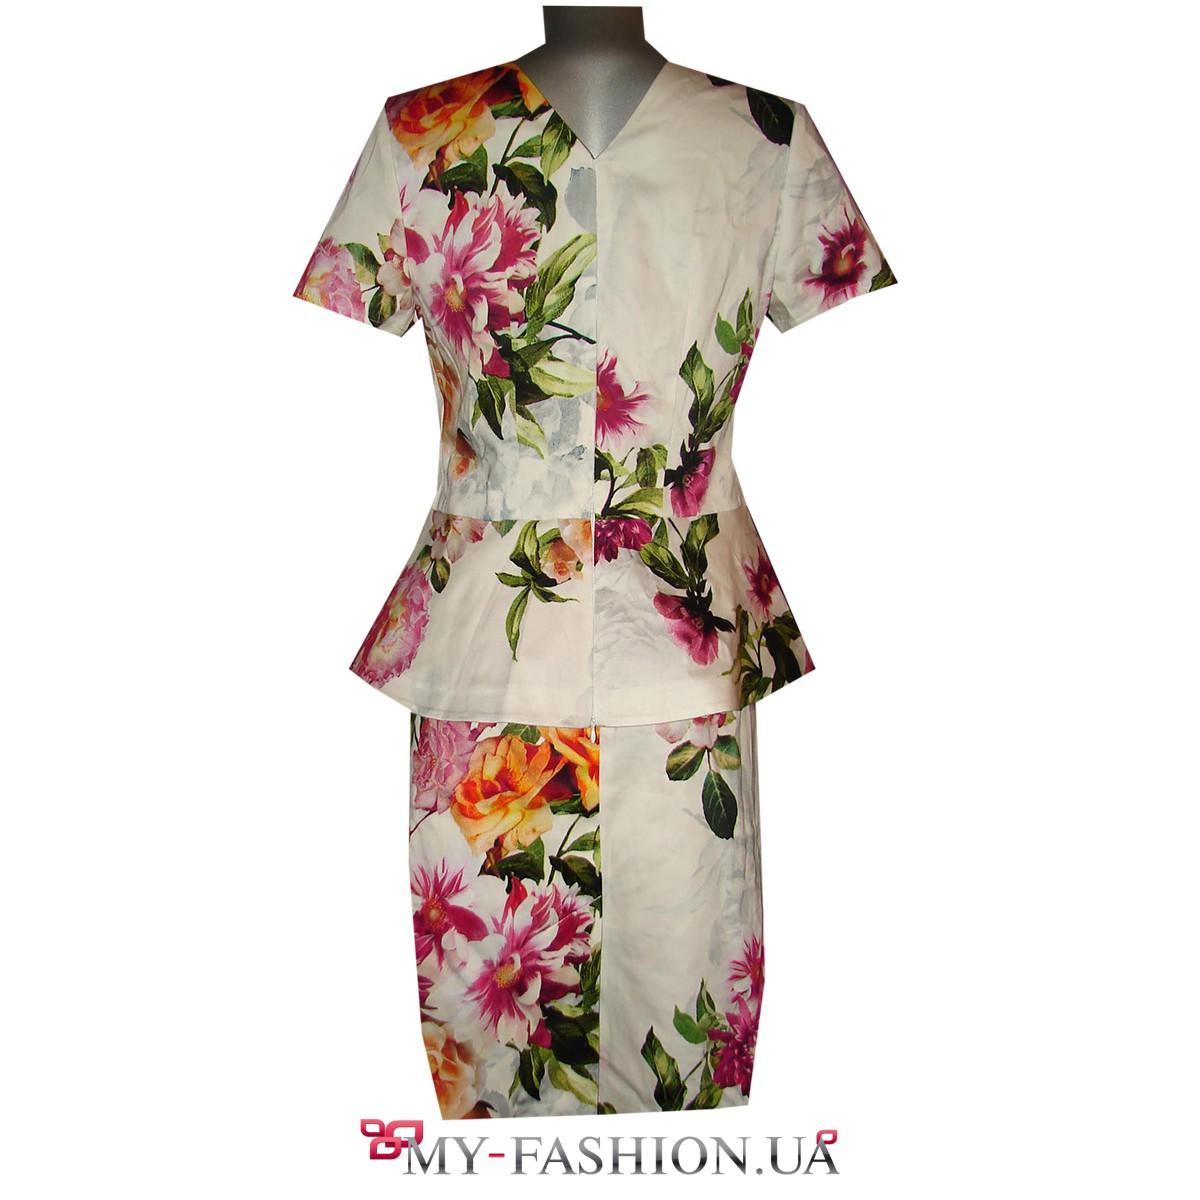 Блузки с коротким рукавом купить